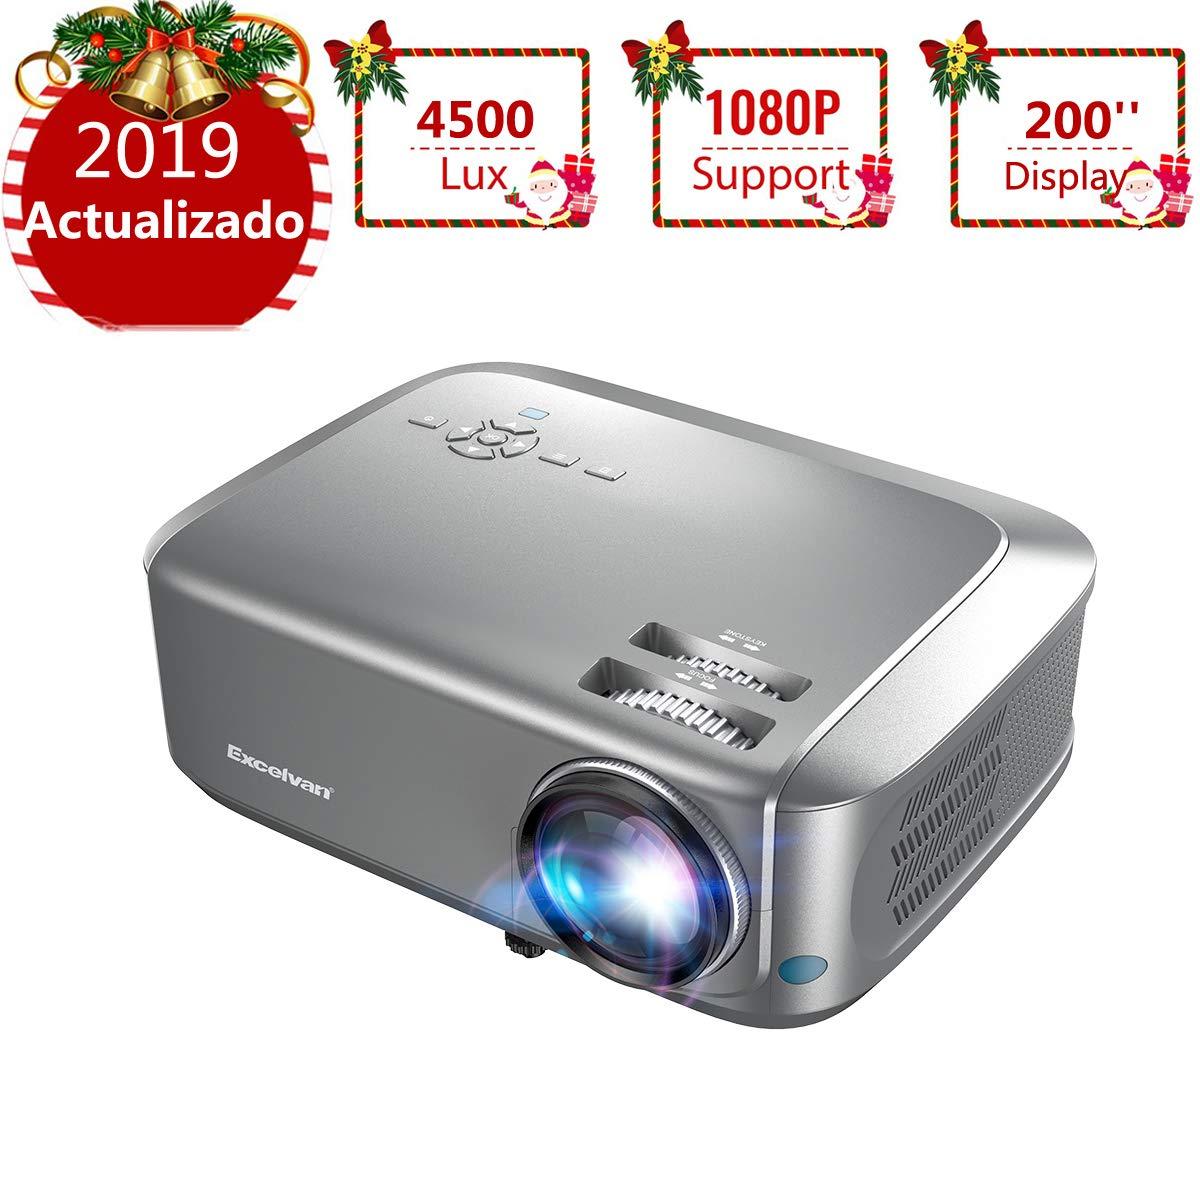 Proyector4500 Lúmenes Excelvan Proyector de Video Portátil Resolución 1280*768P Soporte 1080P Full HD LCD Contraste 1000:1 1080P/USB/VGA/SD/HDMI para ...